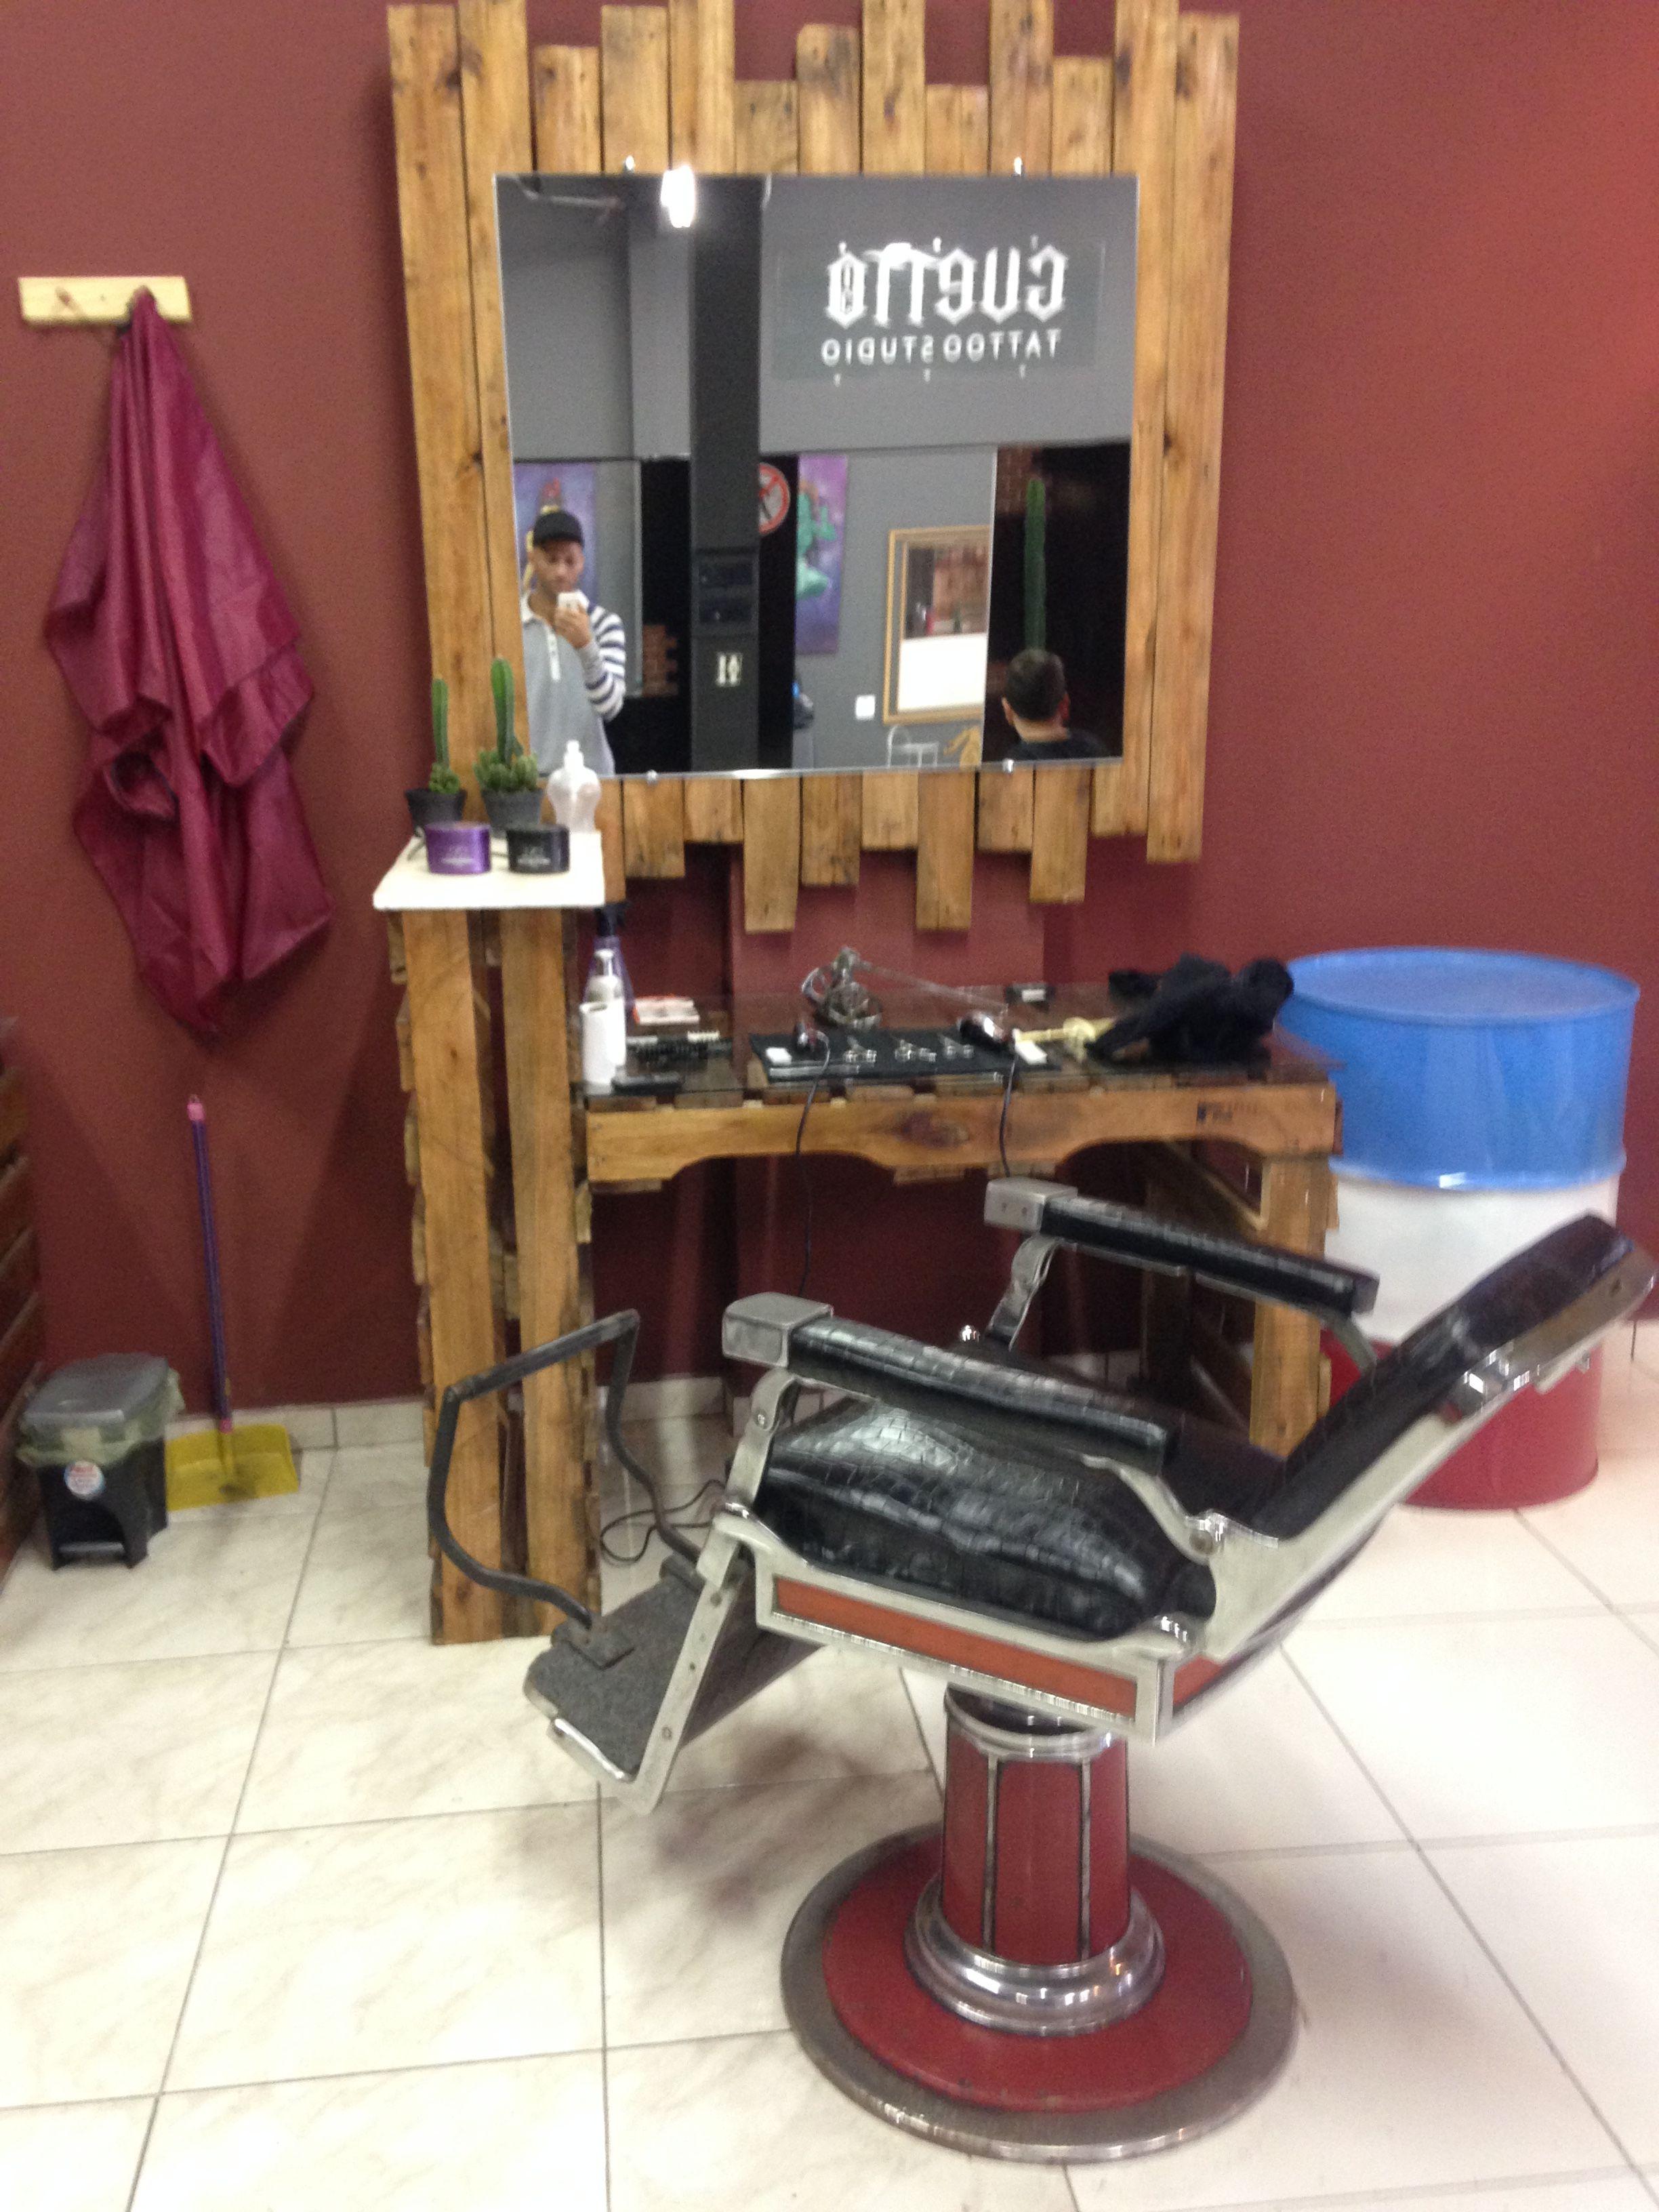 Uadson Do Pallets Barber 237 A En 2019 Decora 231 227 O Barbearia